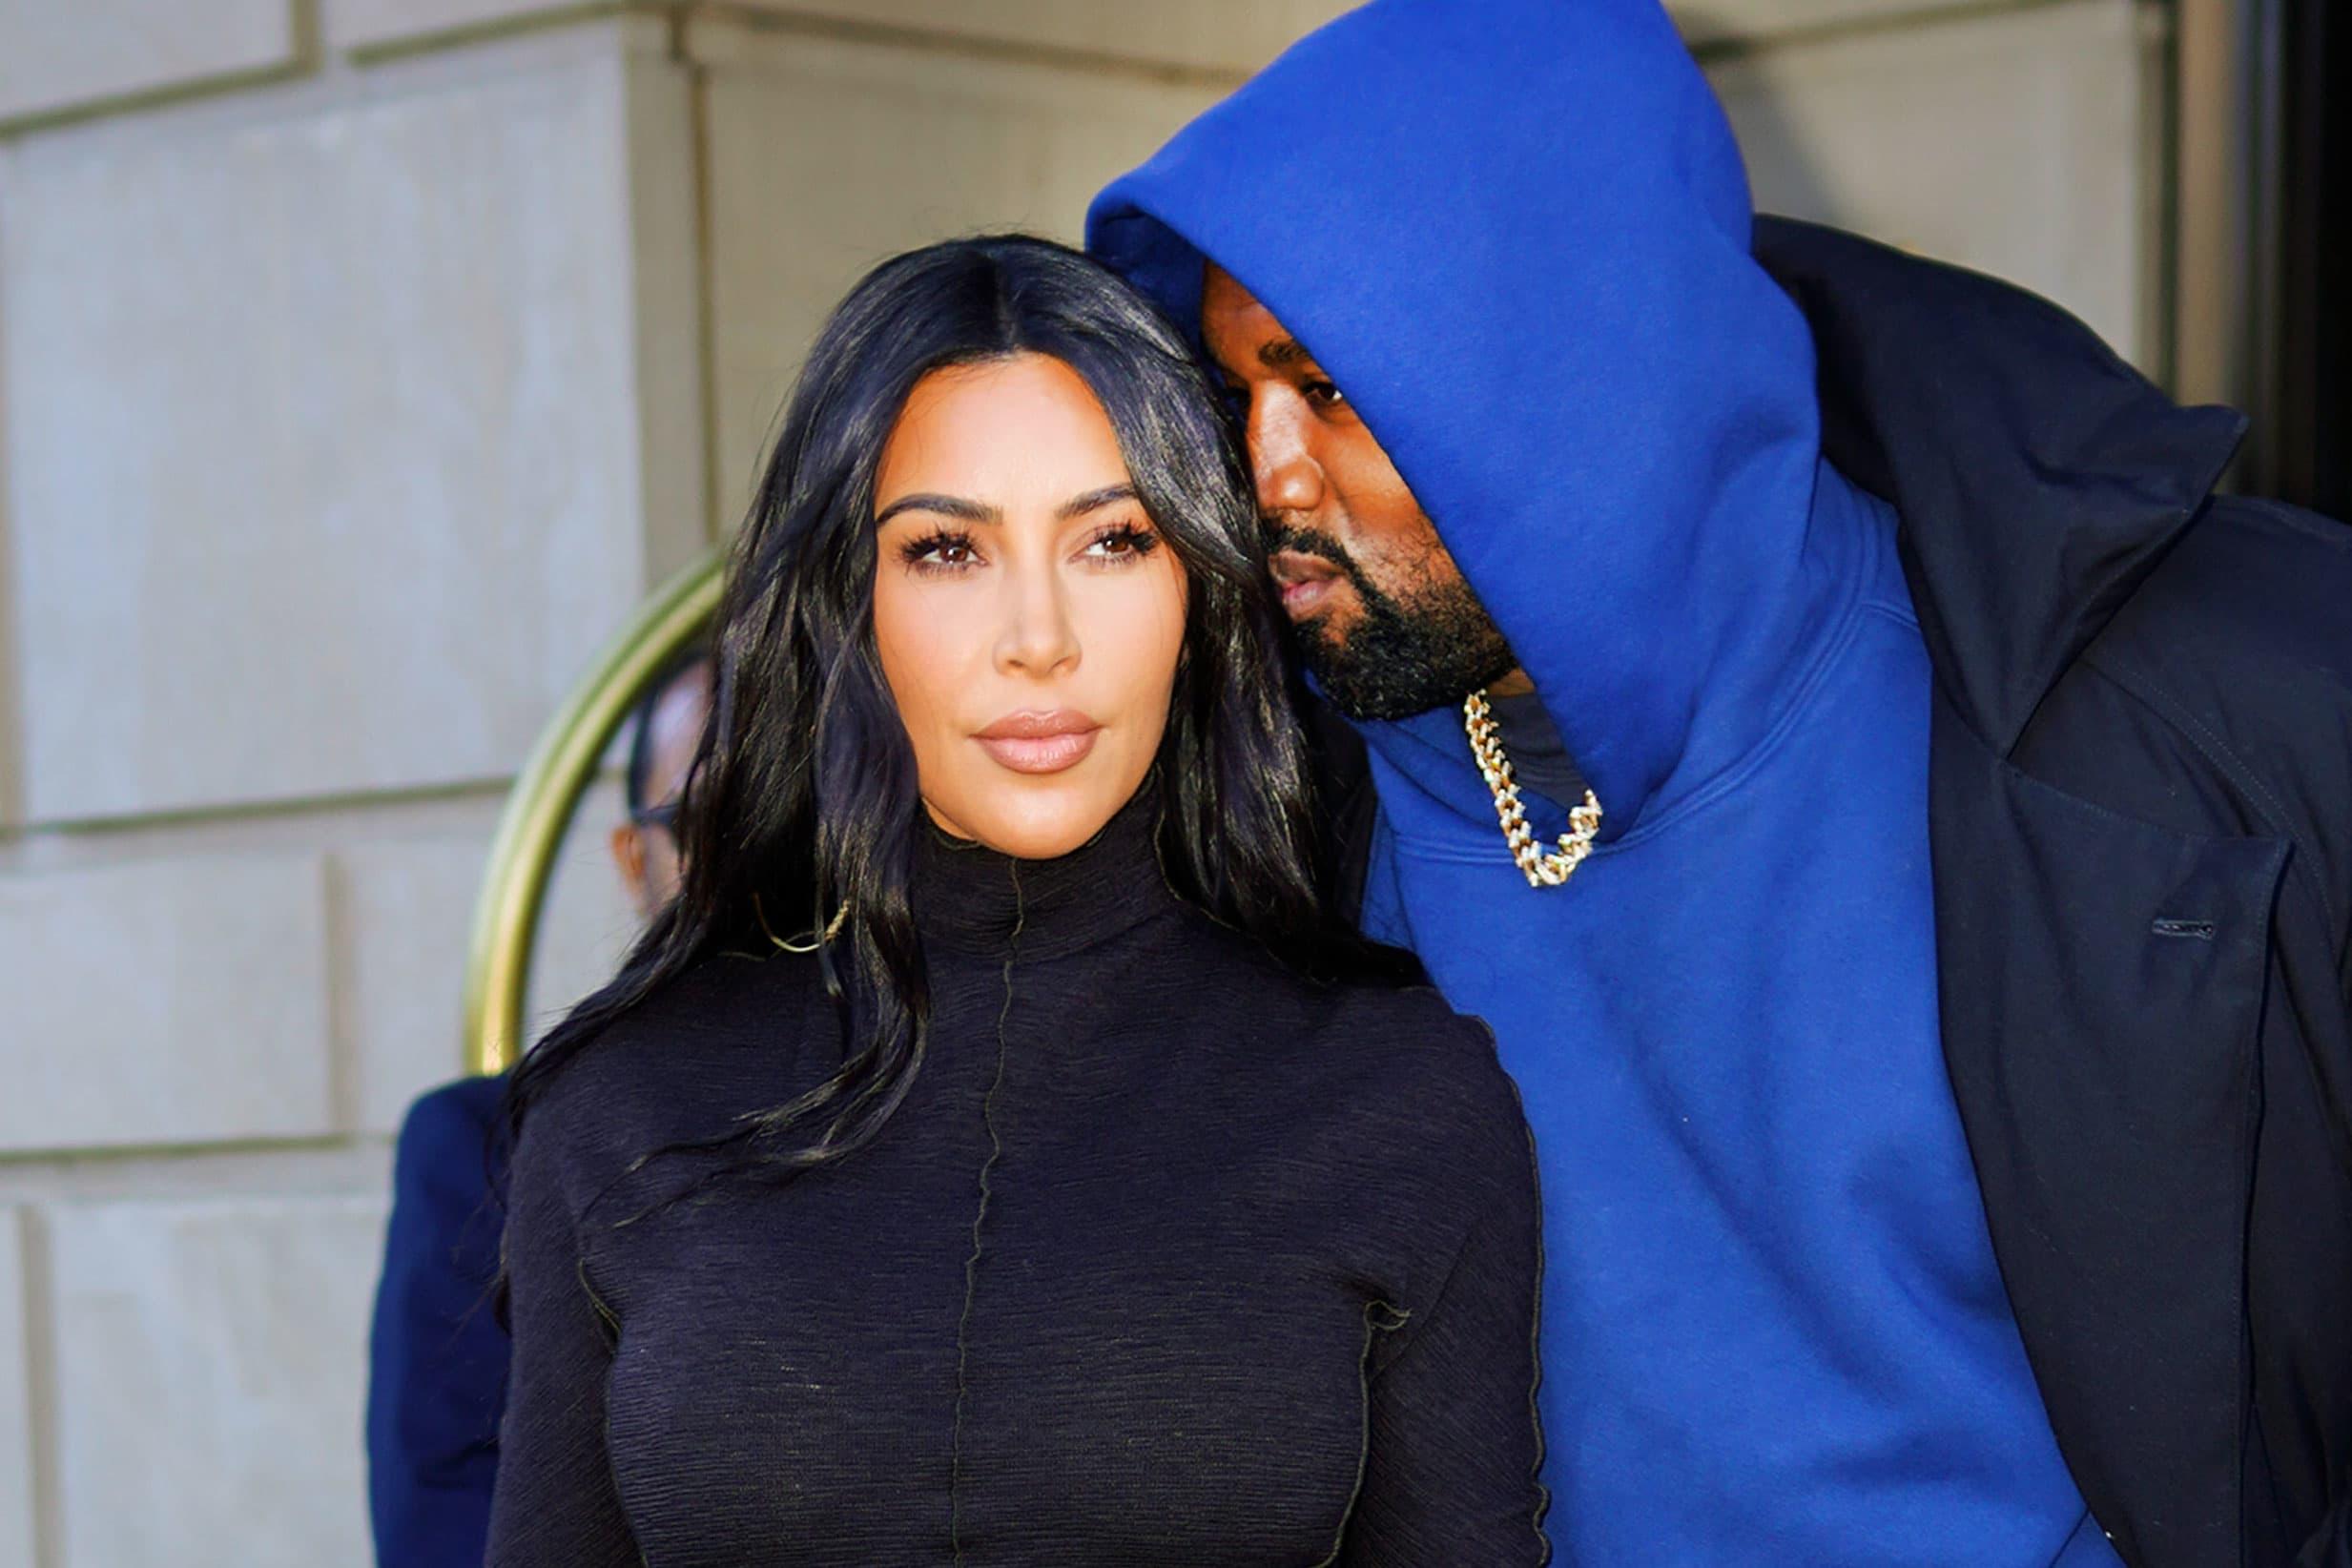 Kanye West says Kardashian work ethic keeps him active: 'It's like modern-day Medici or Rome'